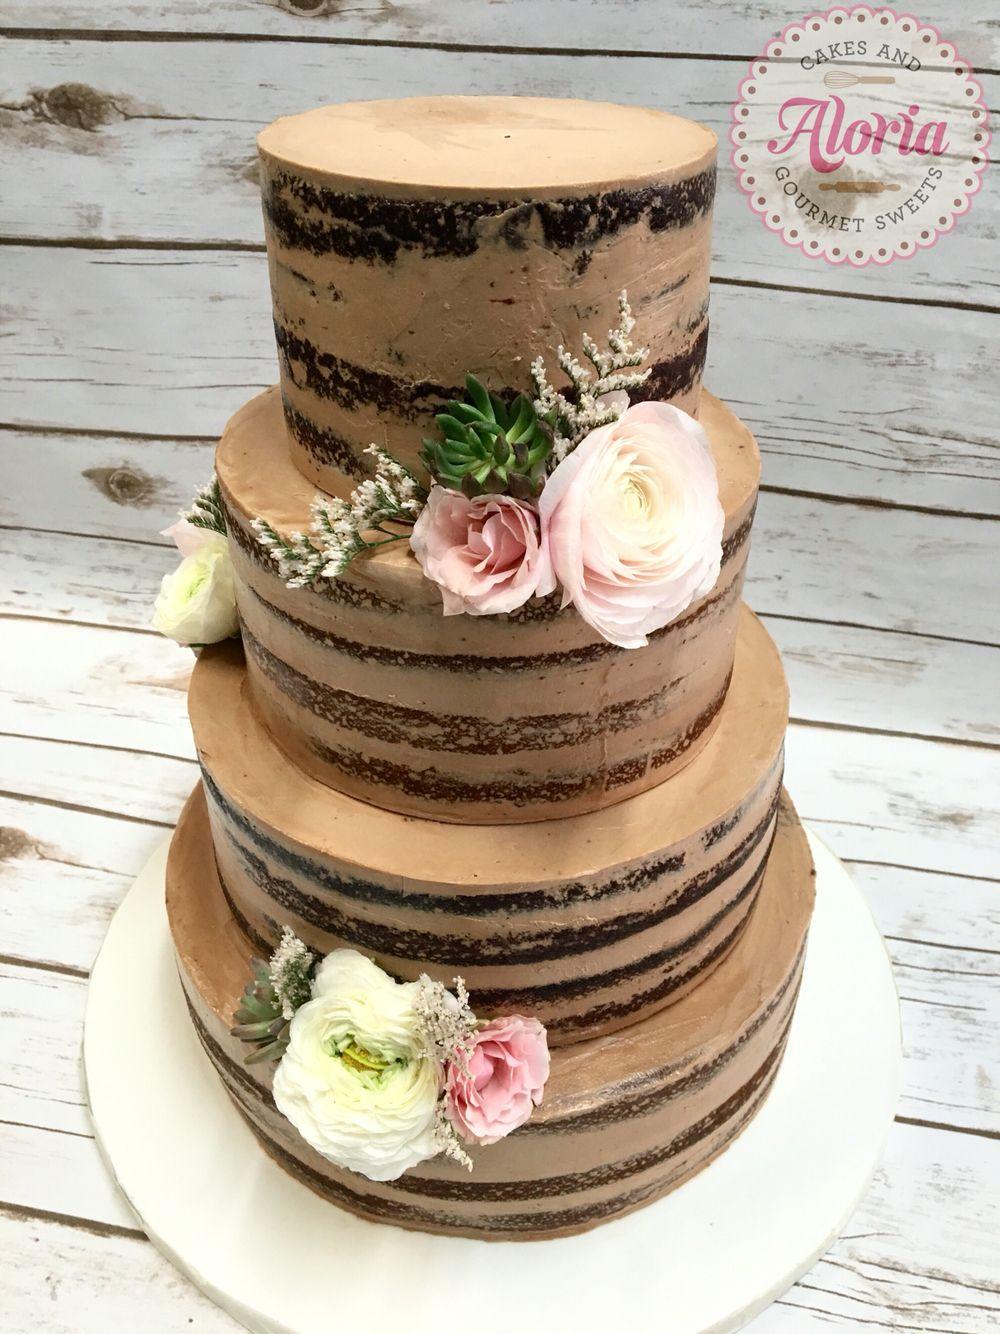 Wedding cake, naked cake with fresh flowers. Alternating chocolate and vanilla cakes, Nutella Swiss meringue buttercream.